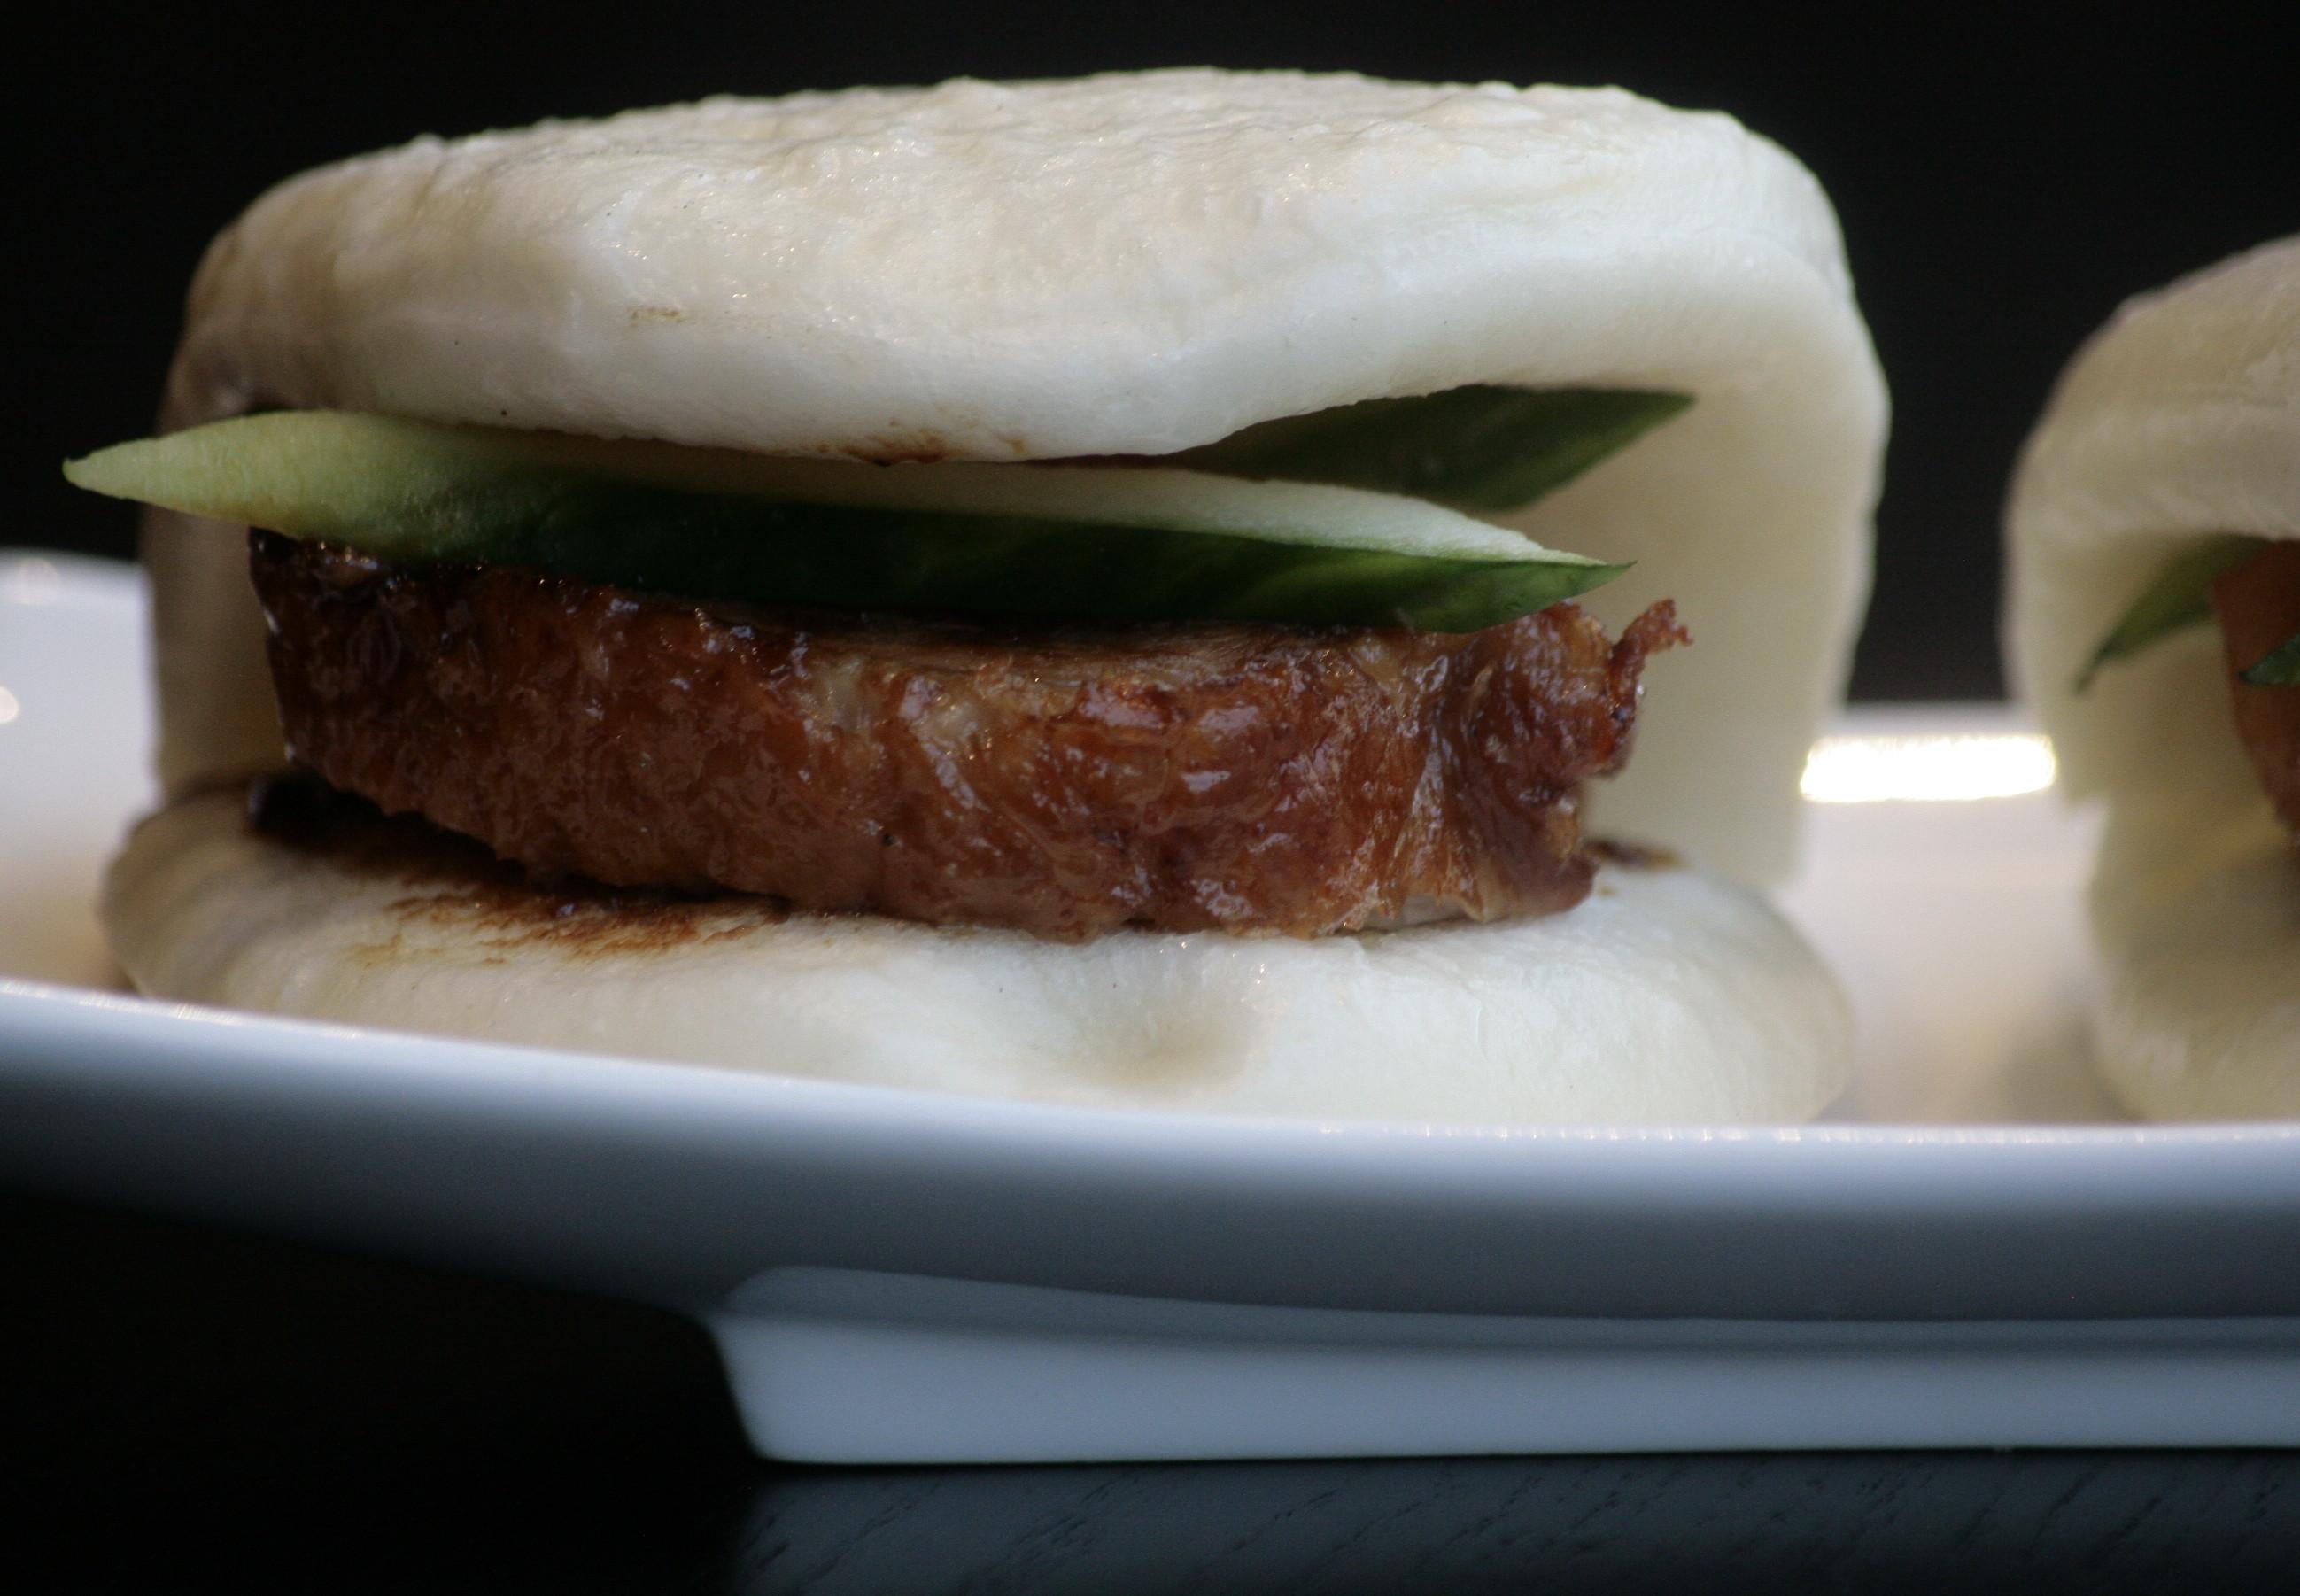 C1 Siu Ab Bao Geroosterde eend op een gestoomd Mandarijns broodje met komkommer en hoisin saus.